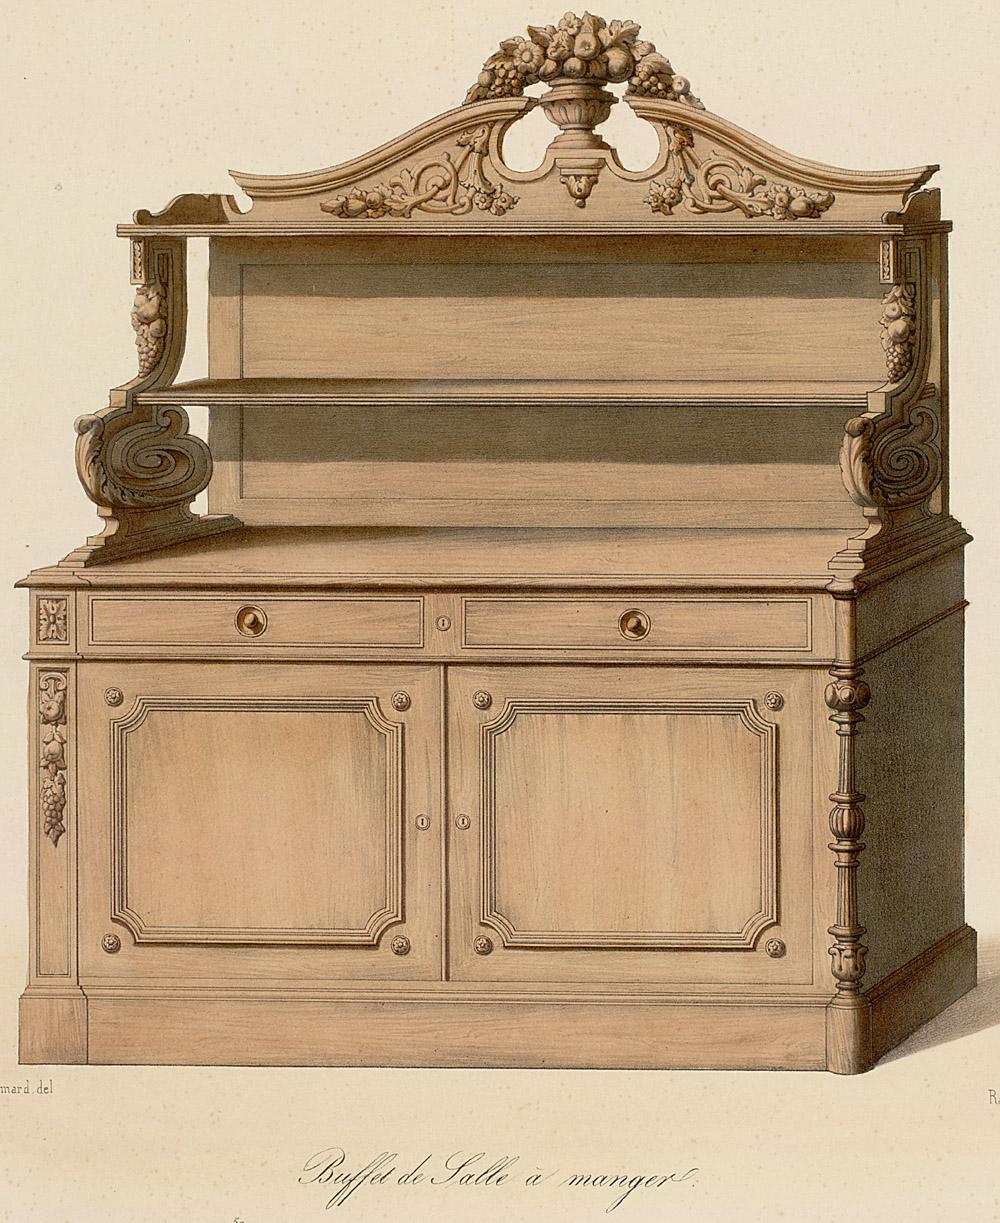 Cabinets (case furniture),  Image number:SIL12-2-231b